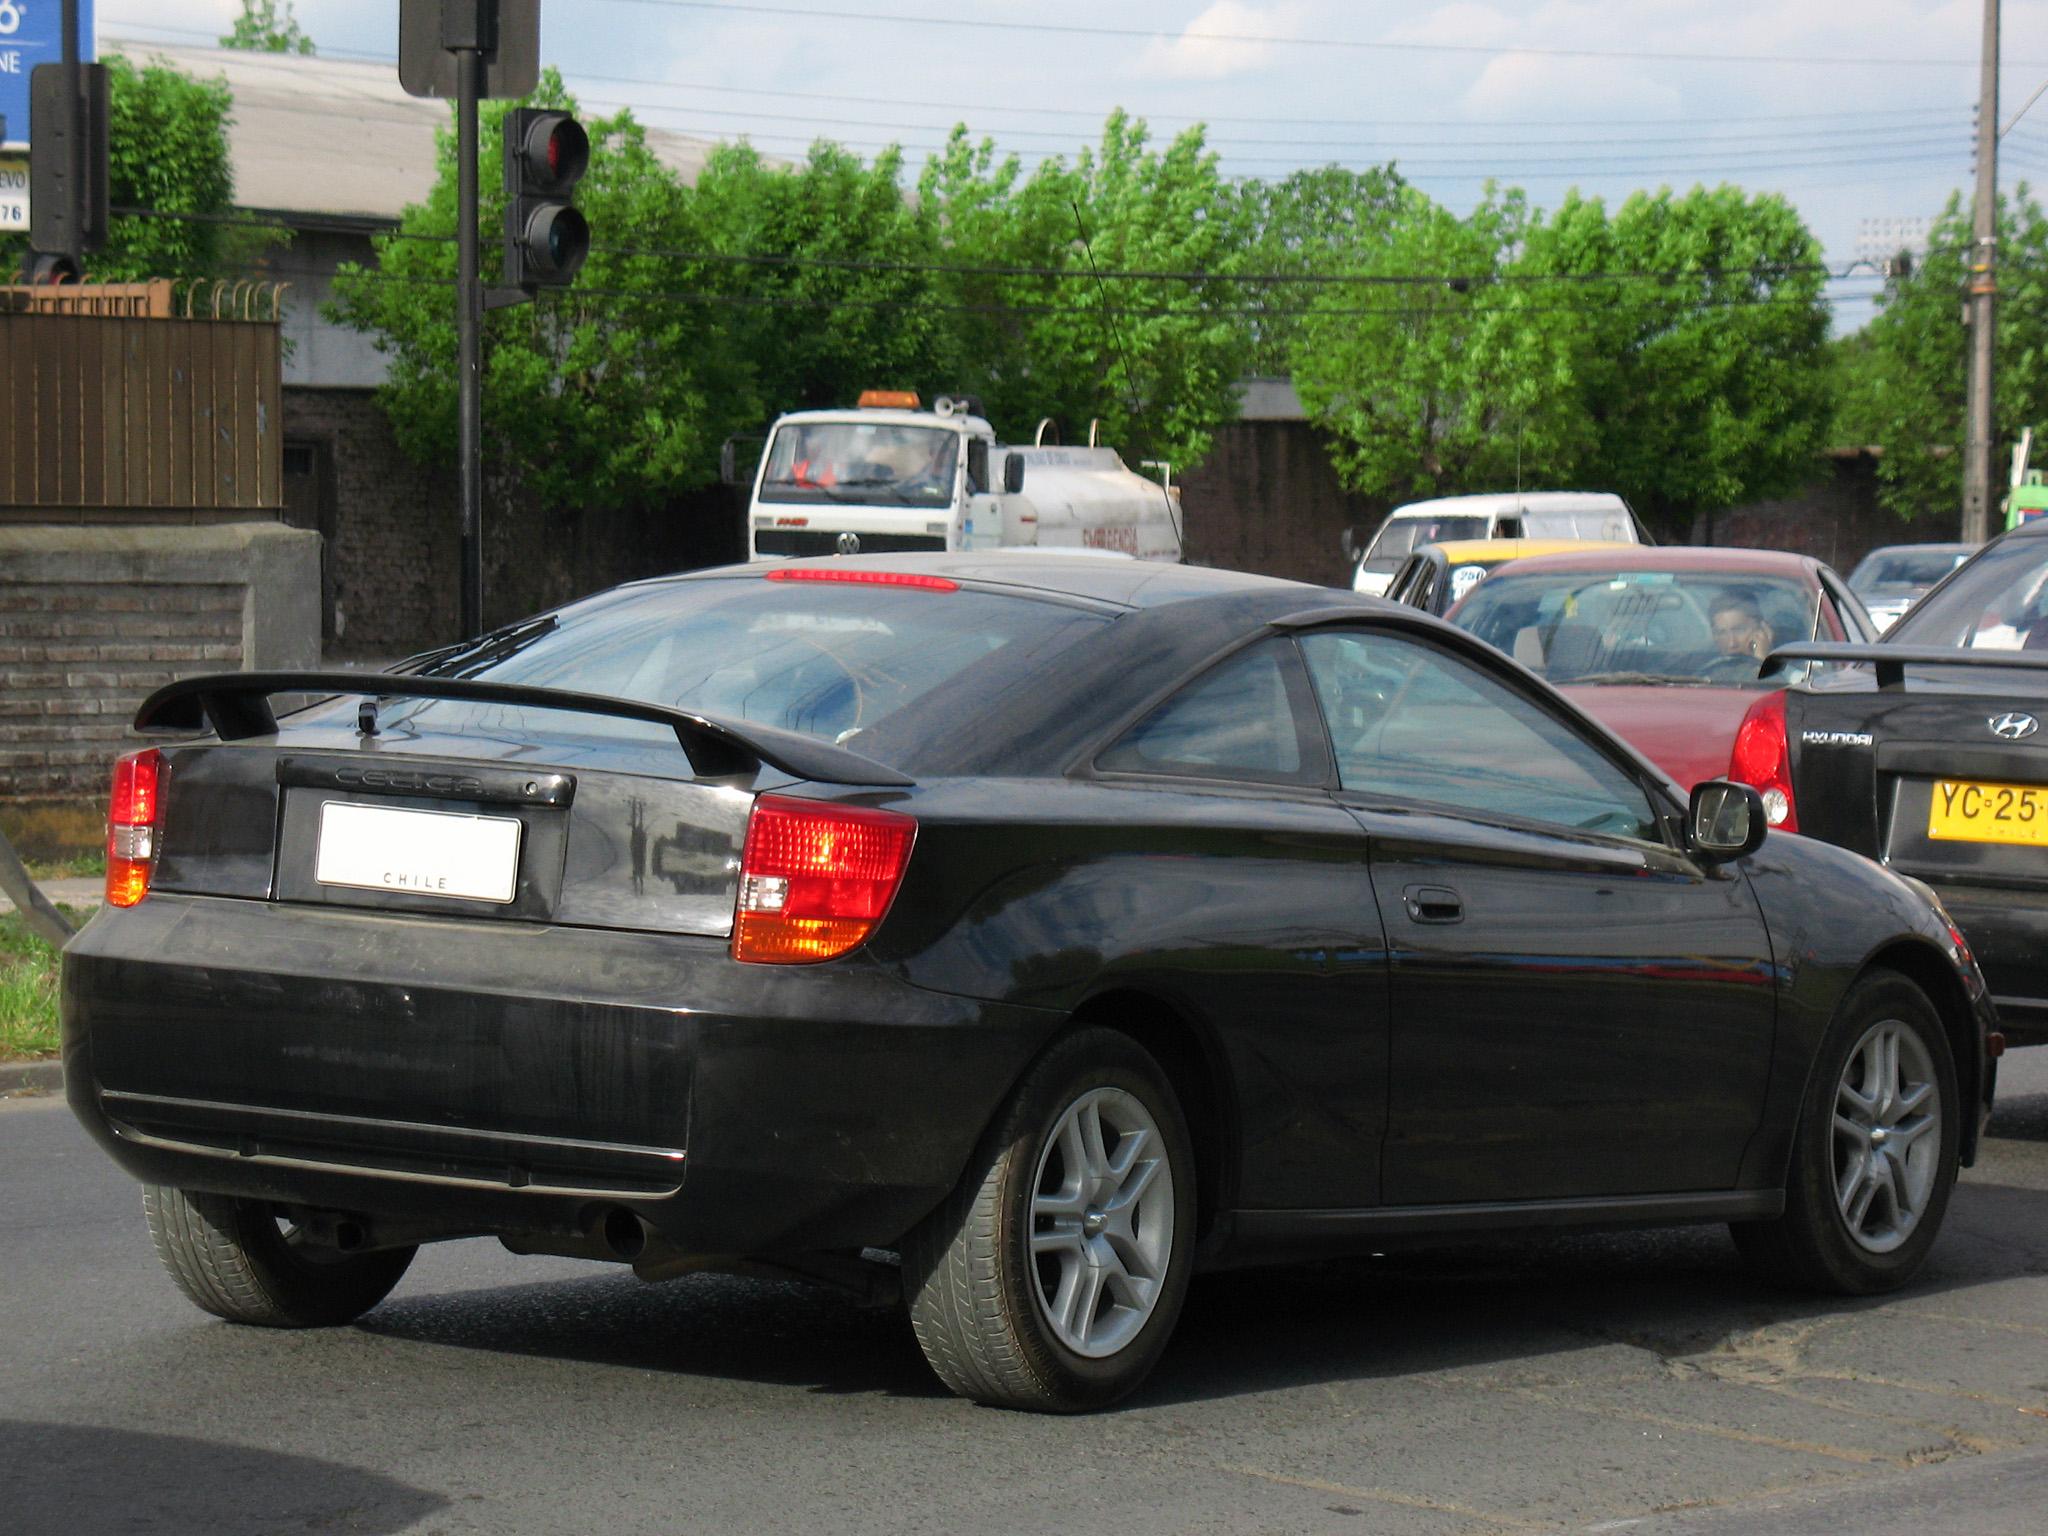 Kelebihan Toyota Celica 2001 Harga